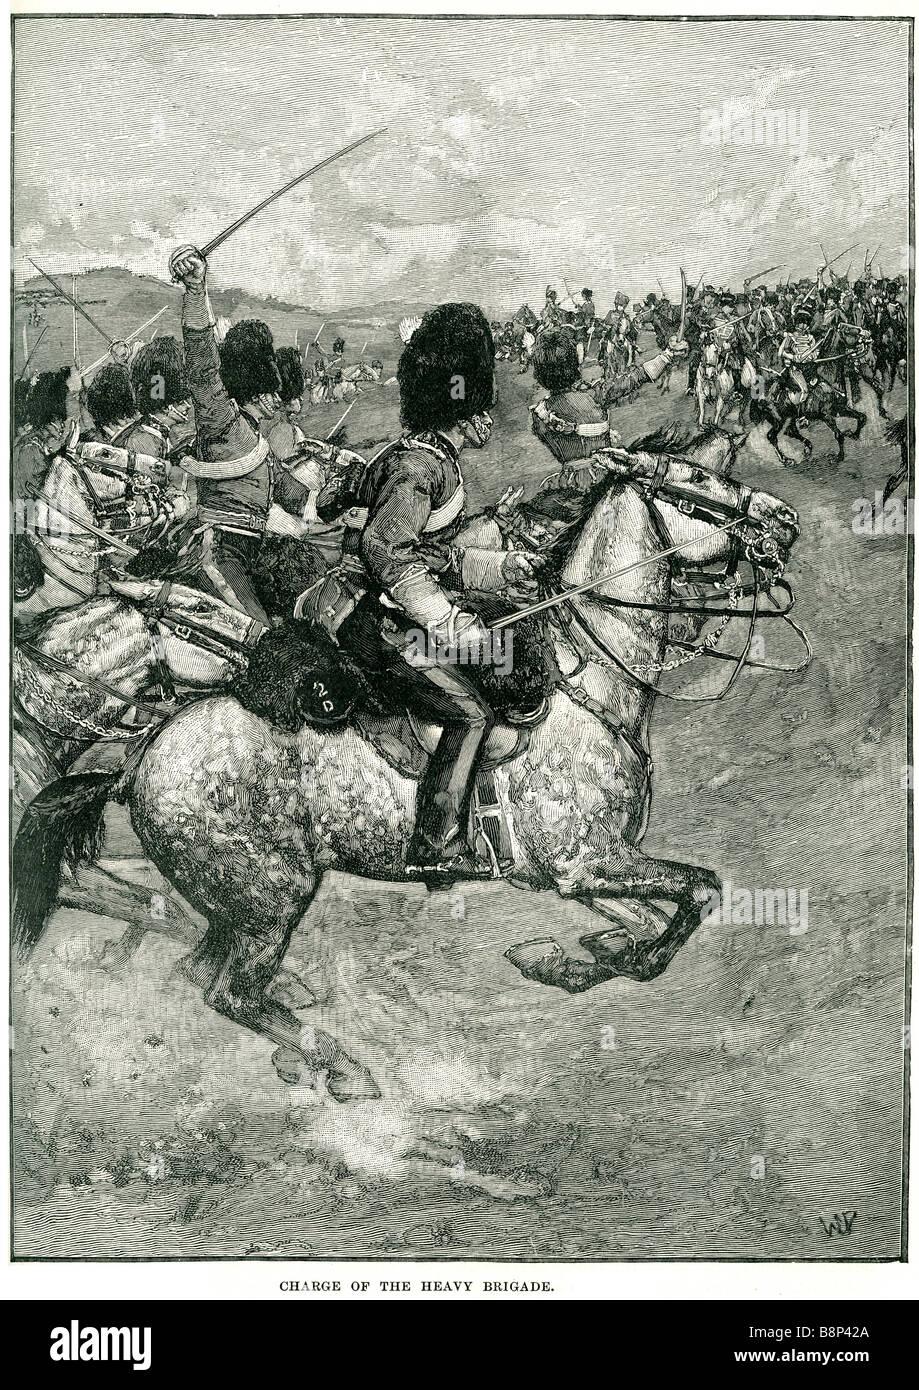 charge heavy brigade 1854 Balaclava Cavalry Dragoon British army - Stock Image